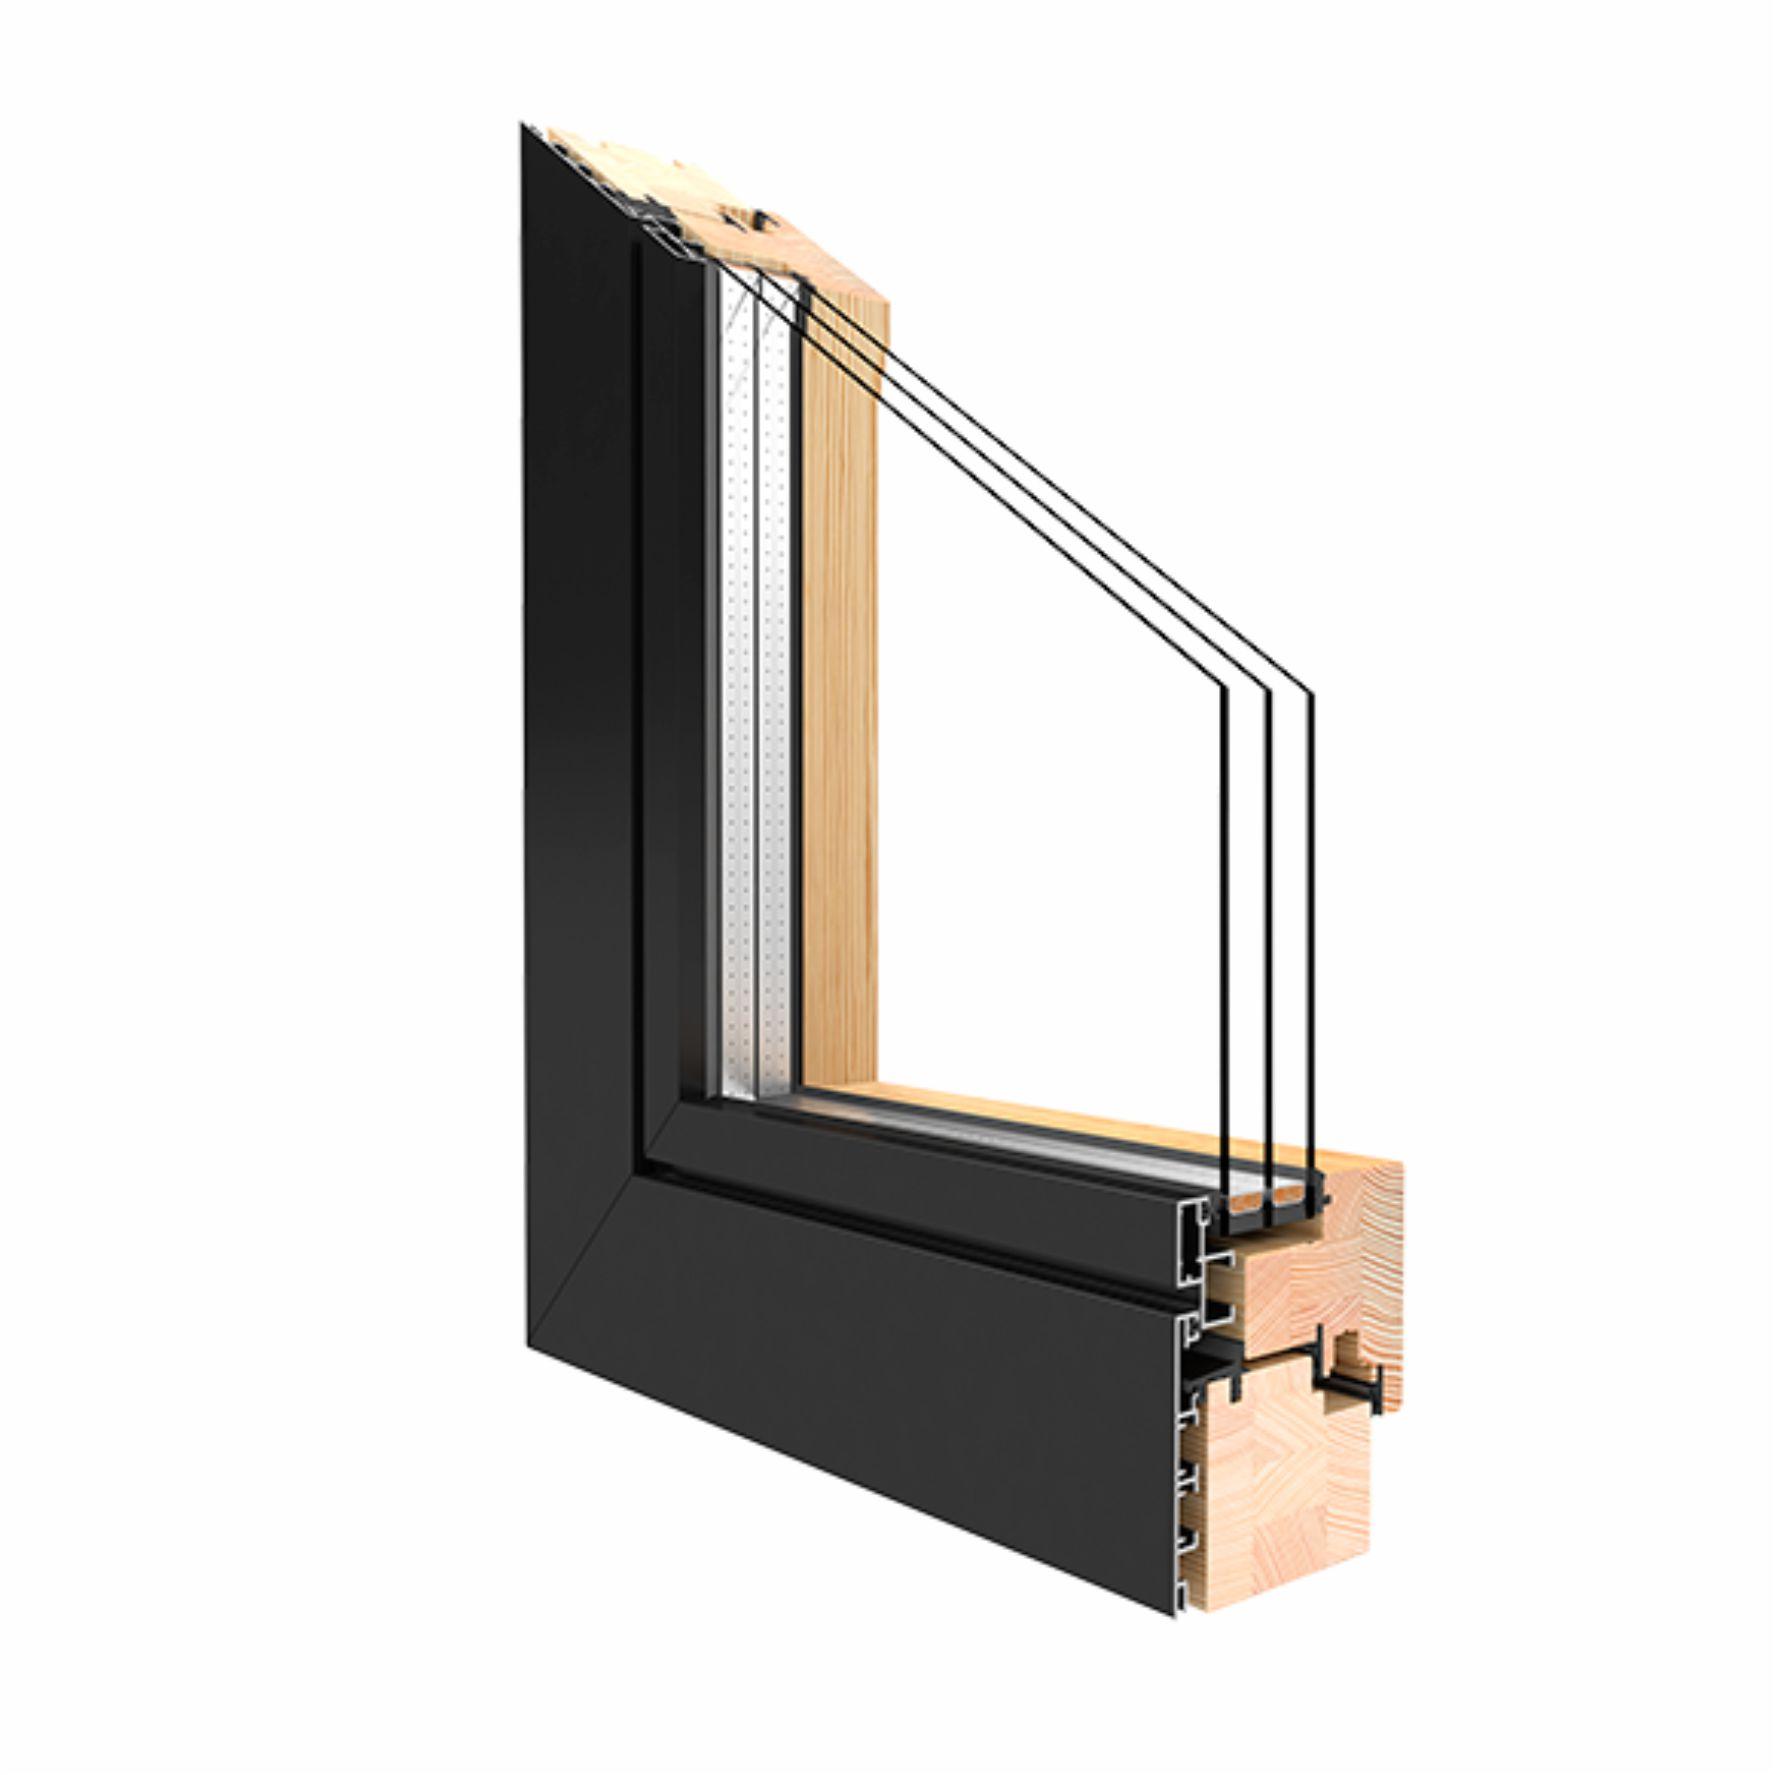 Groß Aluminium Fensterrahmen Extrusionen Galerie - Rahmen Ideen ...